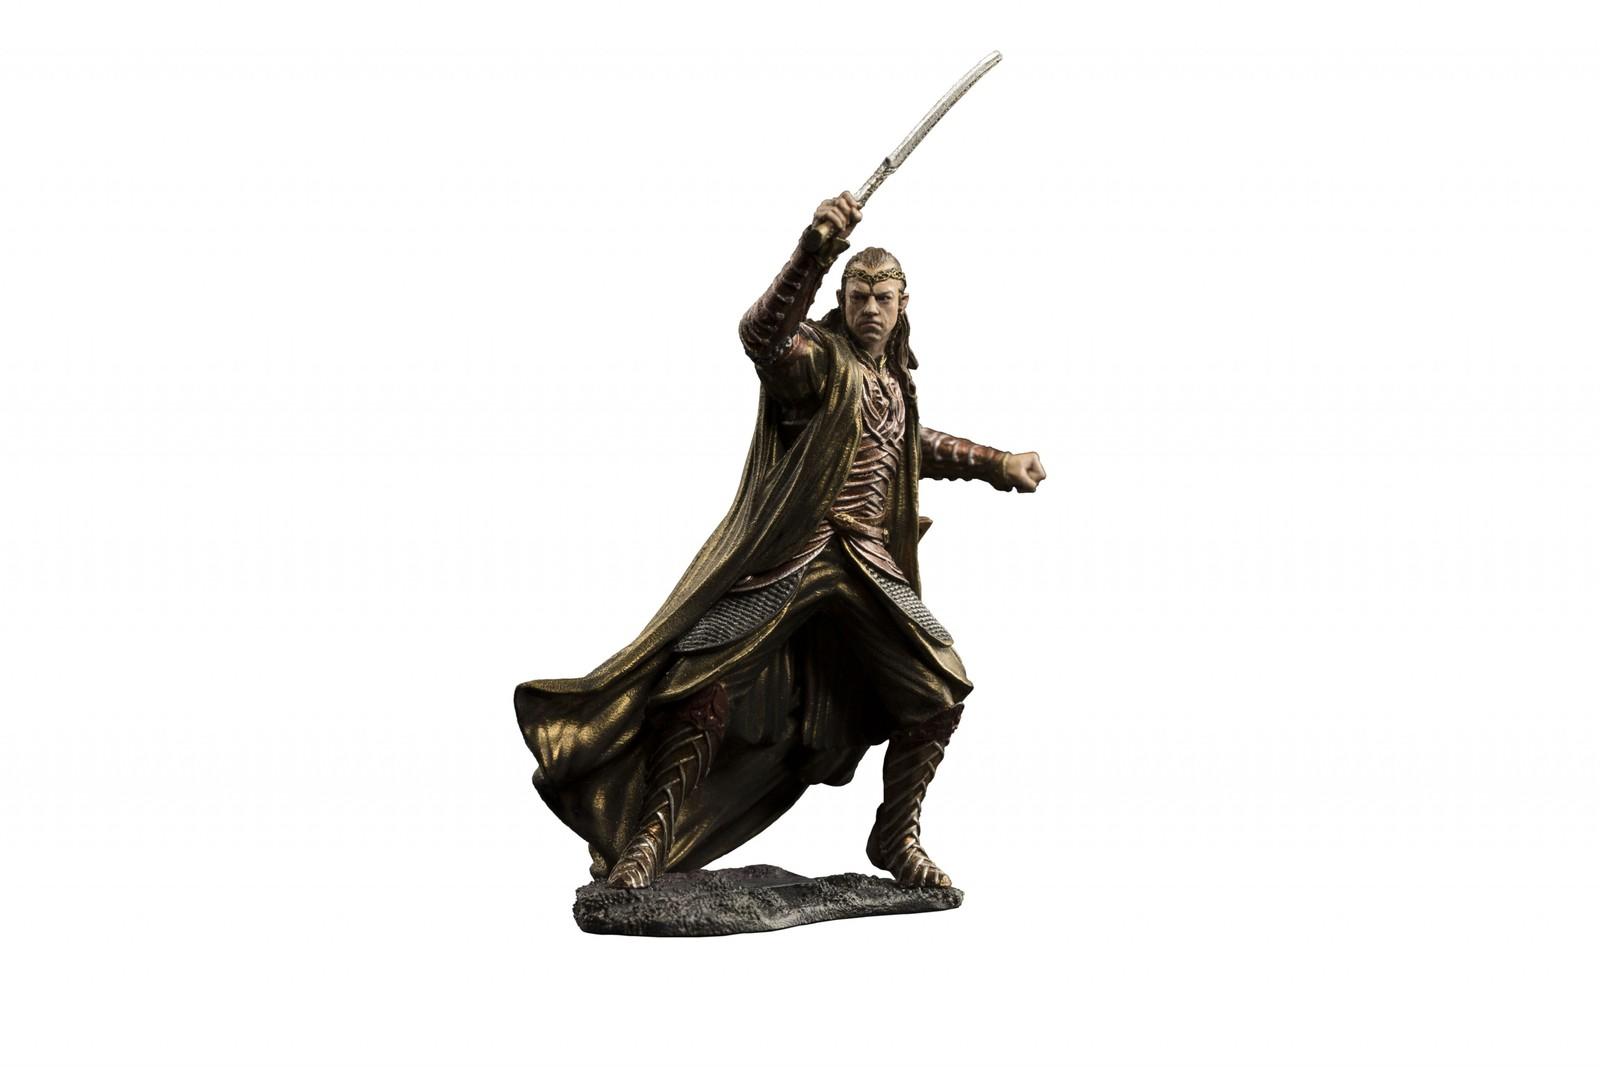 The Hobbit: Lord Elrond Of Rivendell: Dol Guldur - Environment Statue image